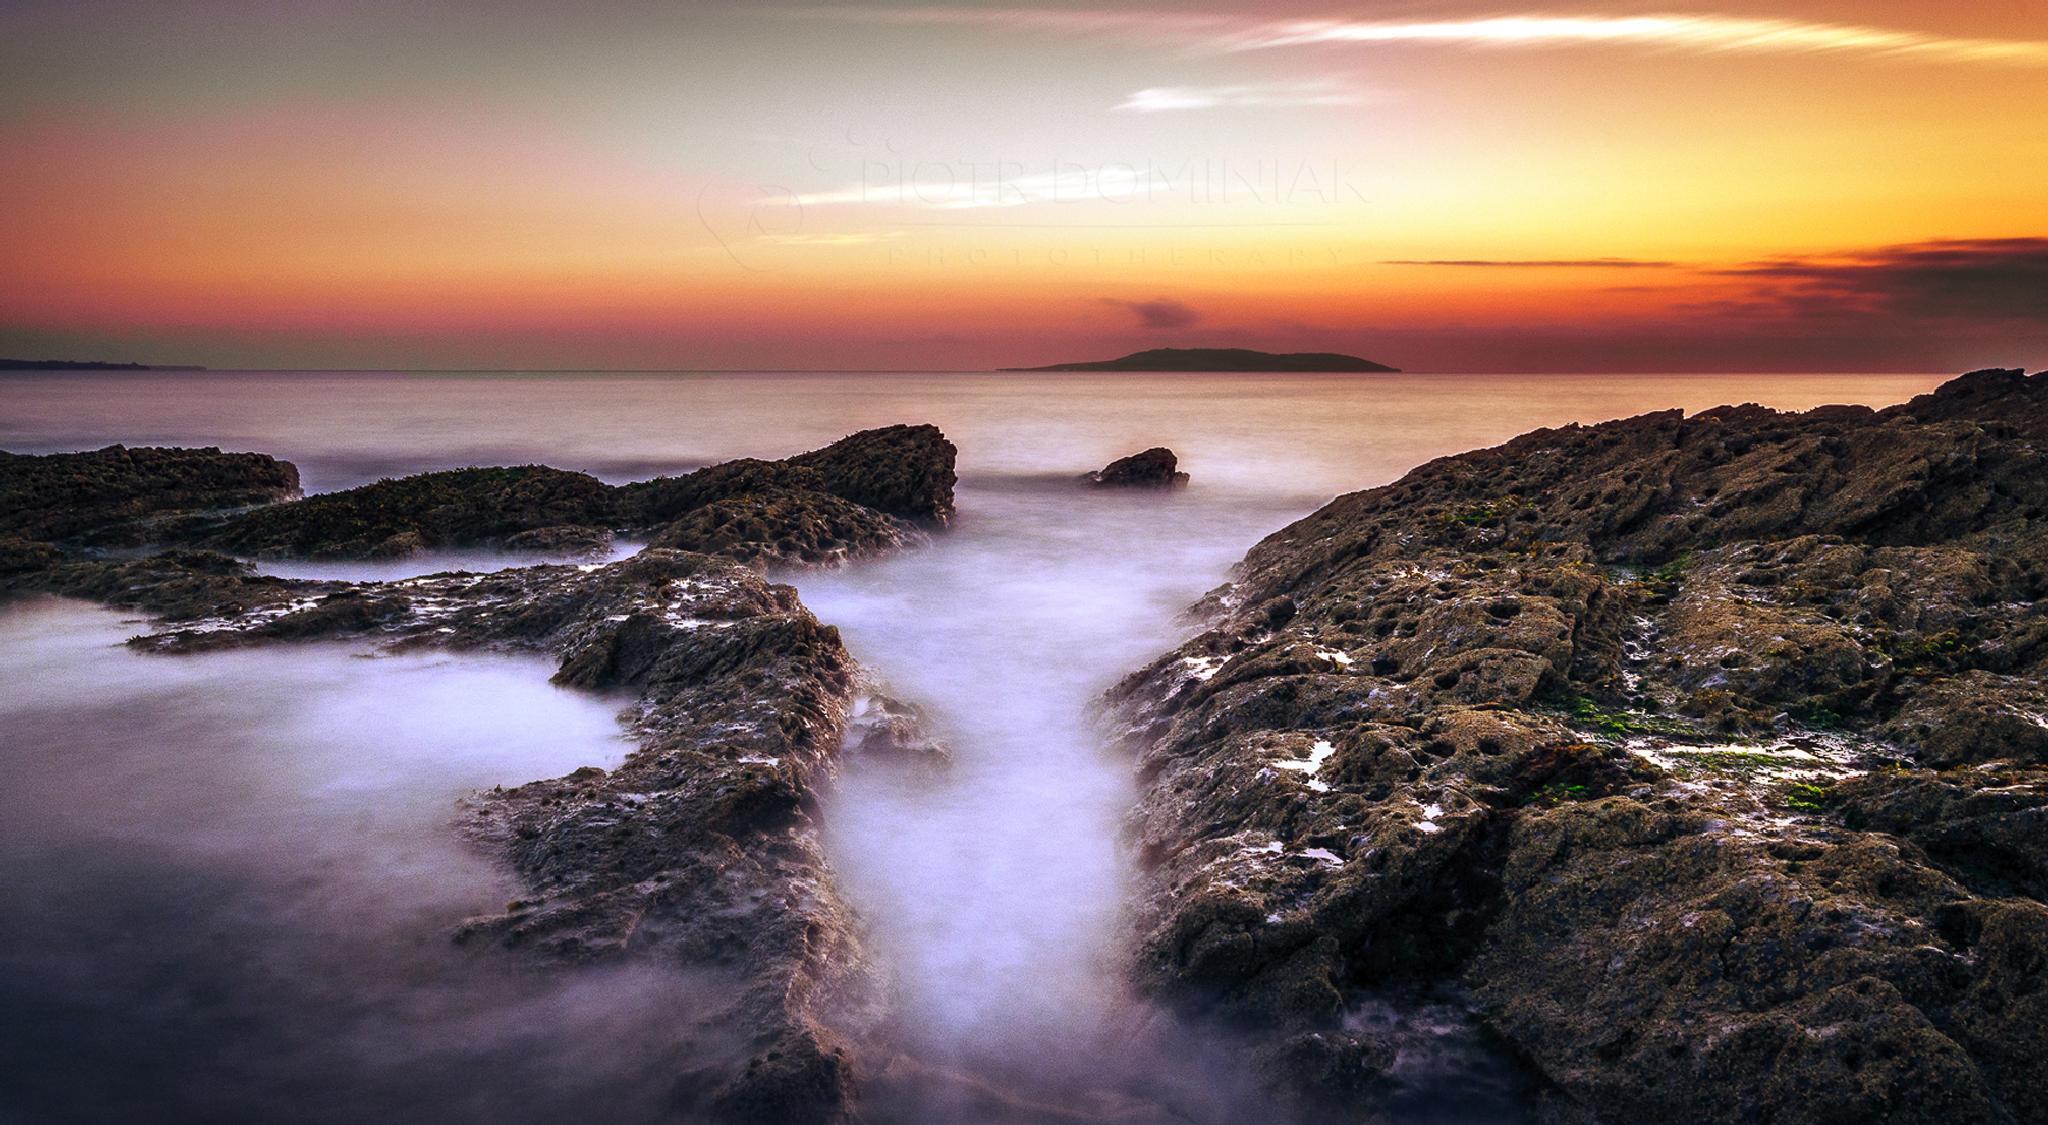 Good morning on the rocks. by Piotr Dominiak